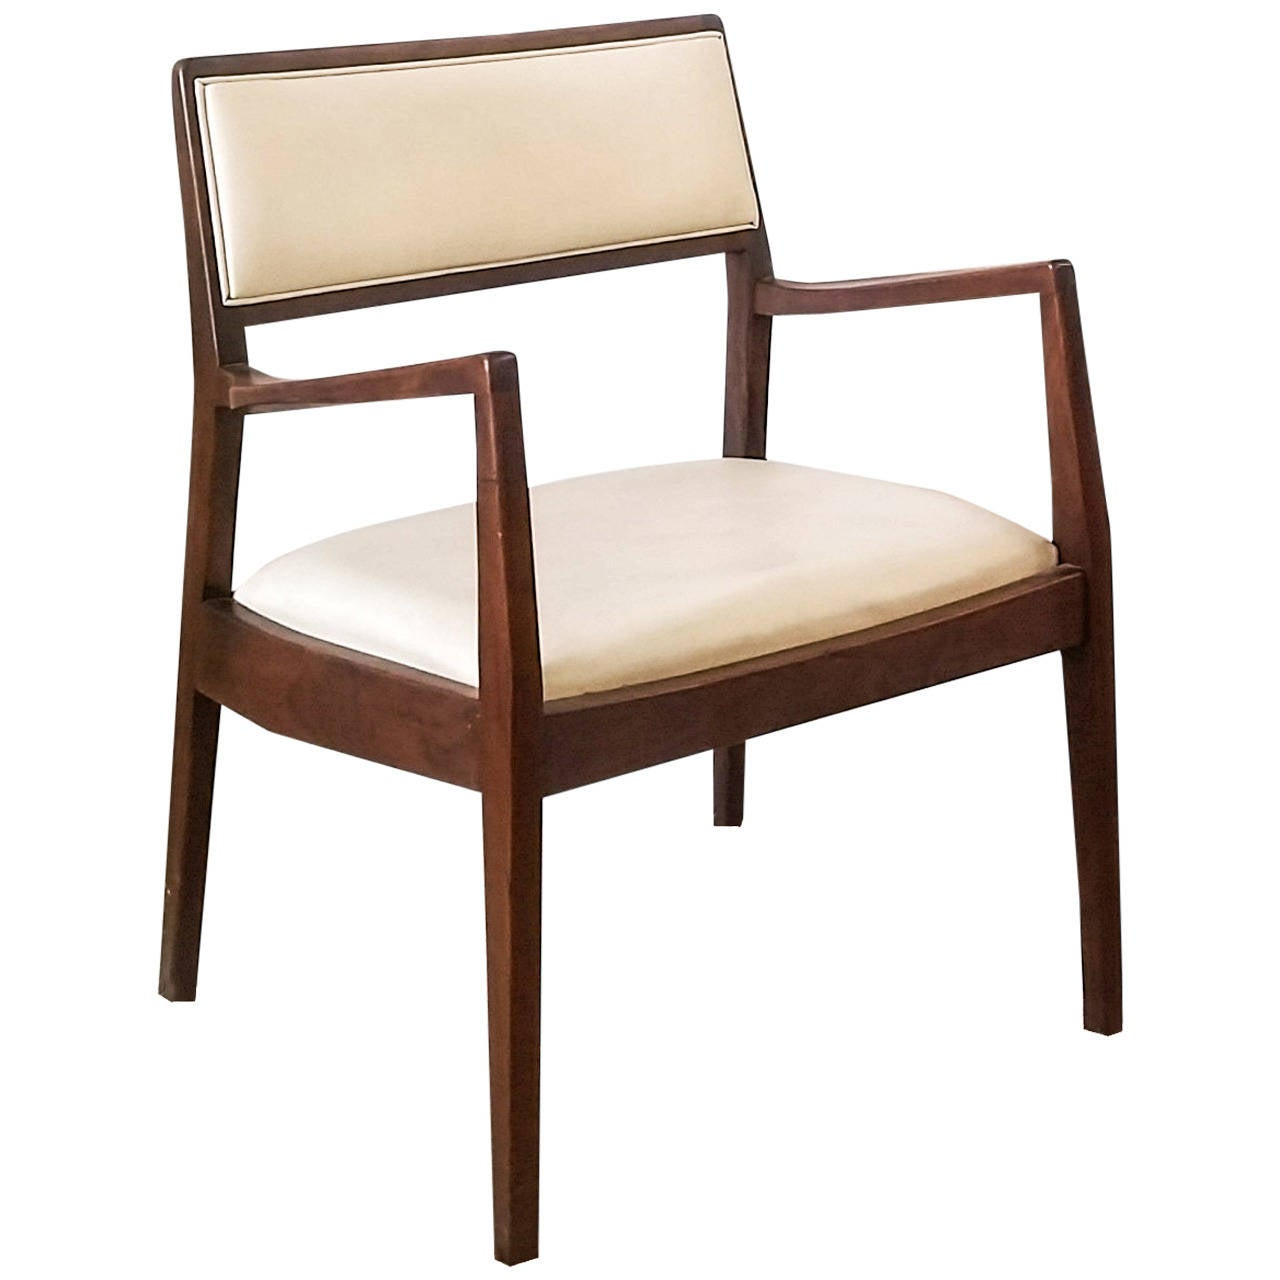 Jens Risom Walnut Lounge Chair at 1stdibs